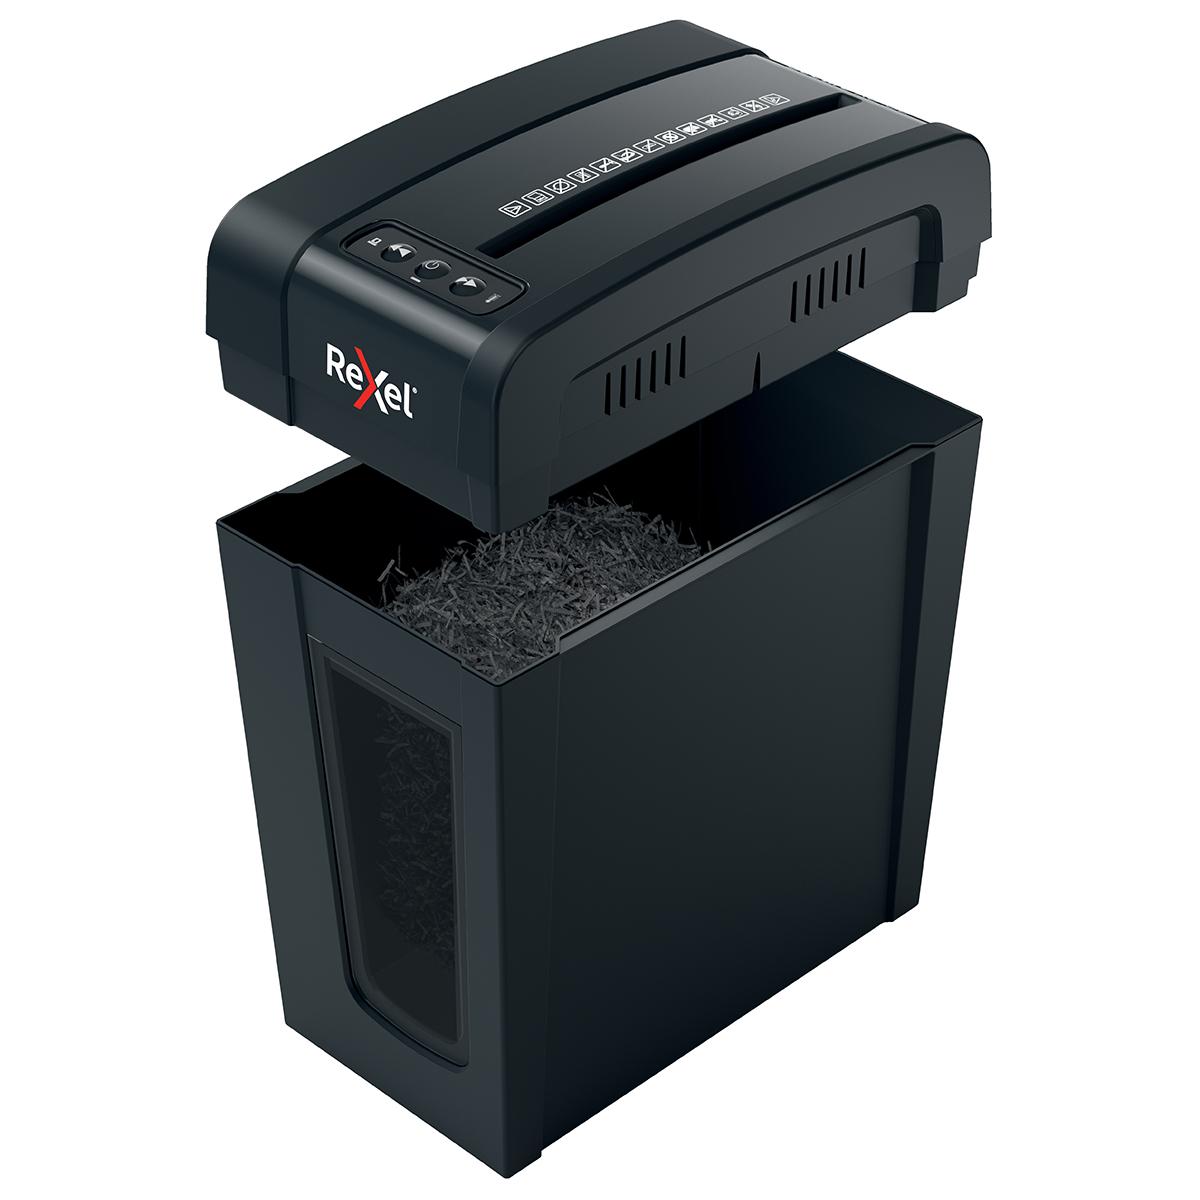 Rexel Secure X8-SL Personal Cross cut Shredder